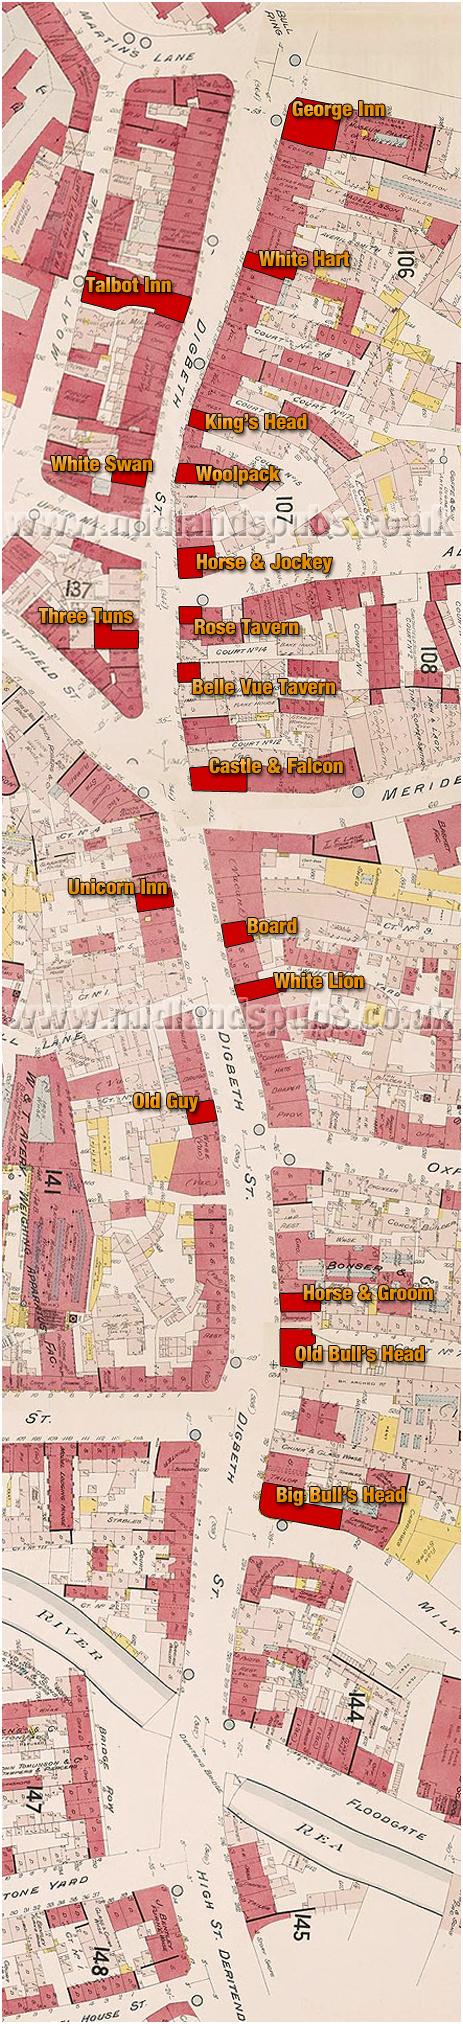 Birmingham : Map of Pubs in Digbeth